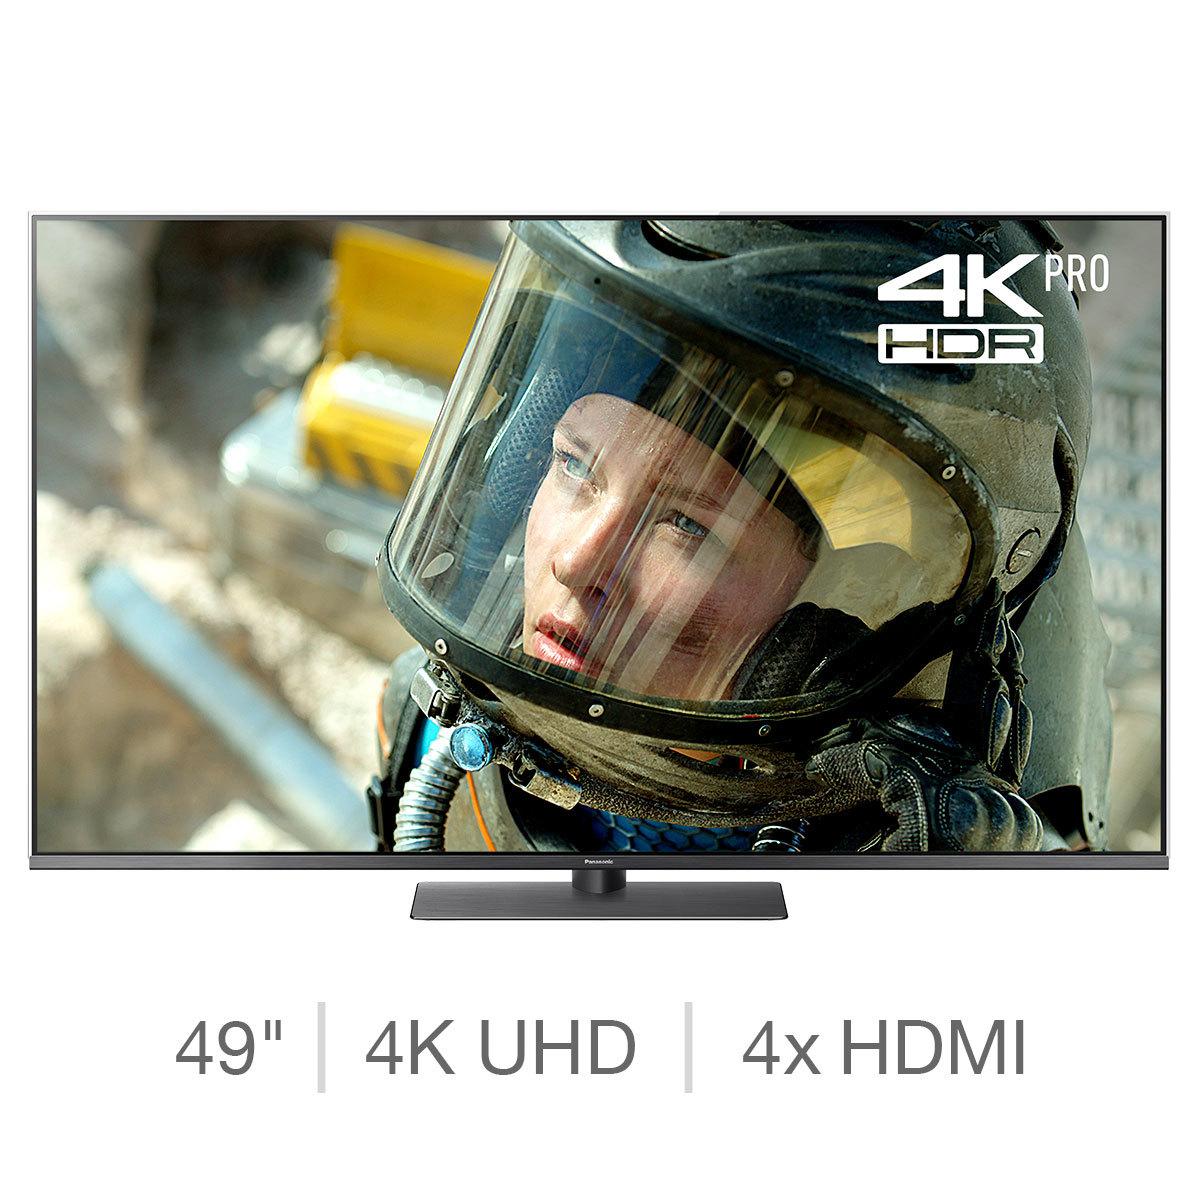 Panasonic 49FX750B 49 Inch 4K Ultra HD TV £649 @ Costco